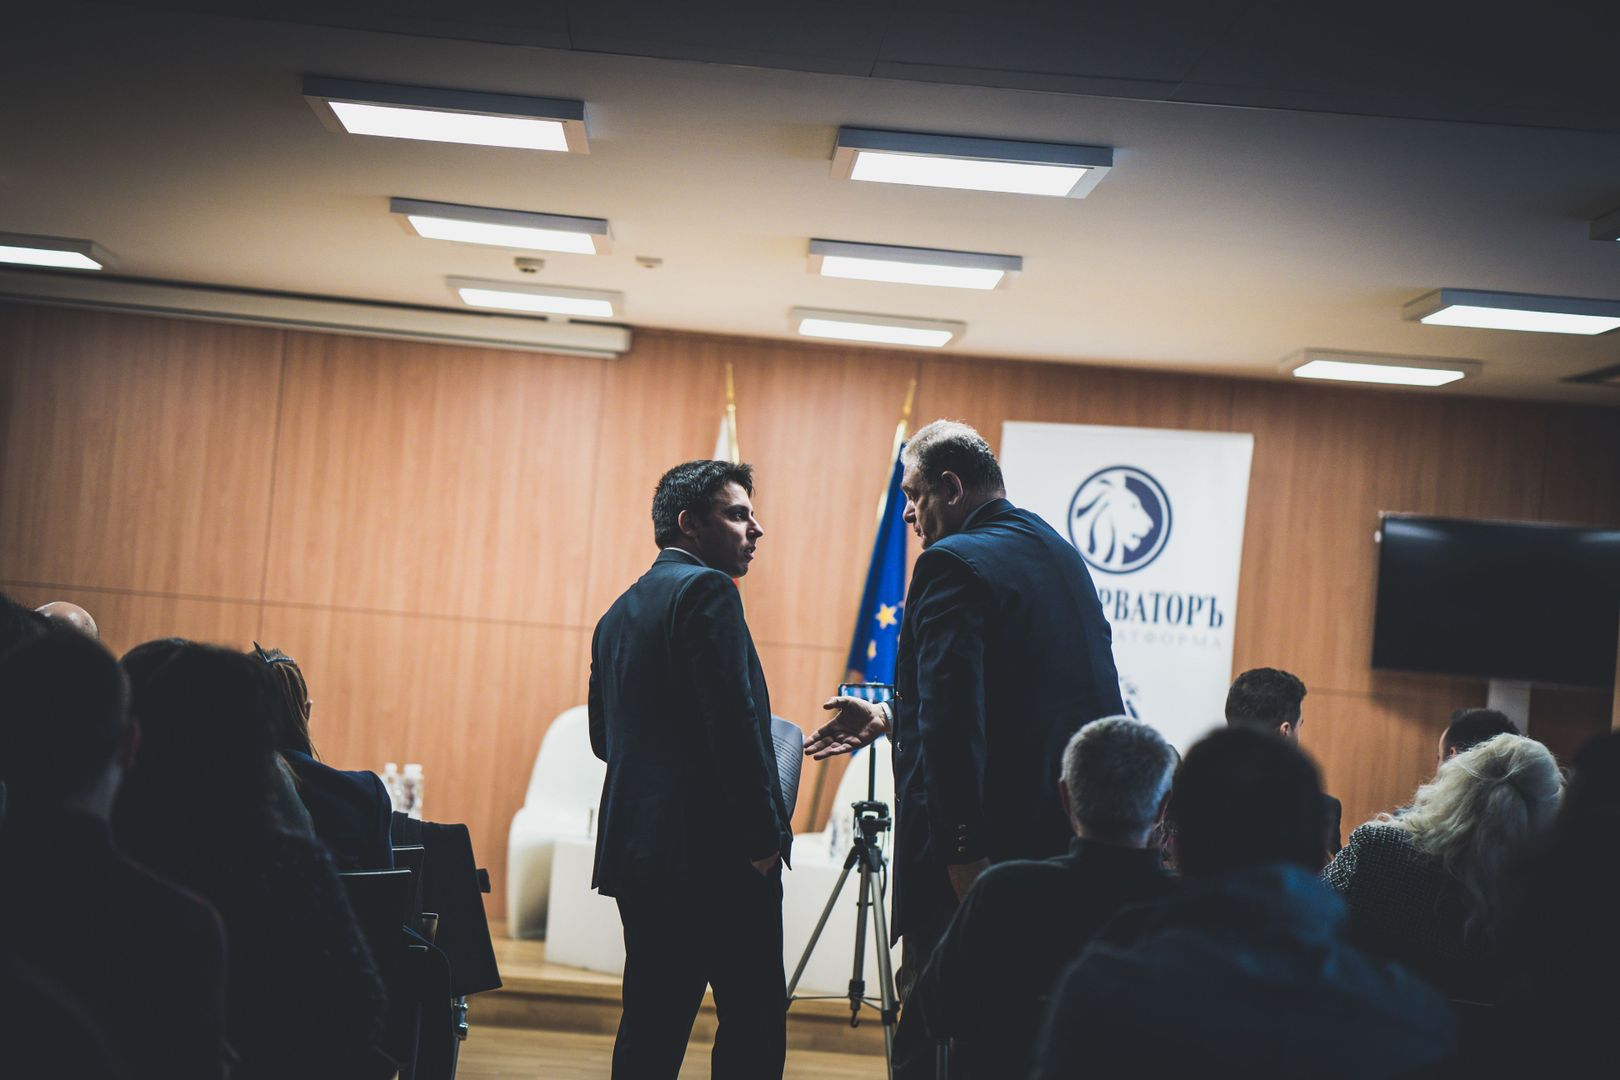 conservative-millenium-strongeurope-event-april-11